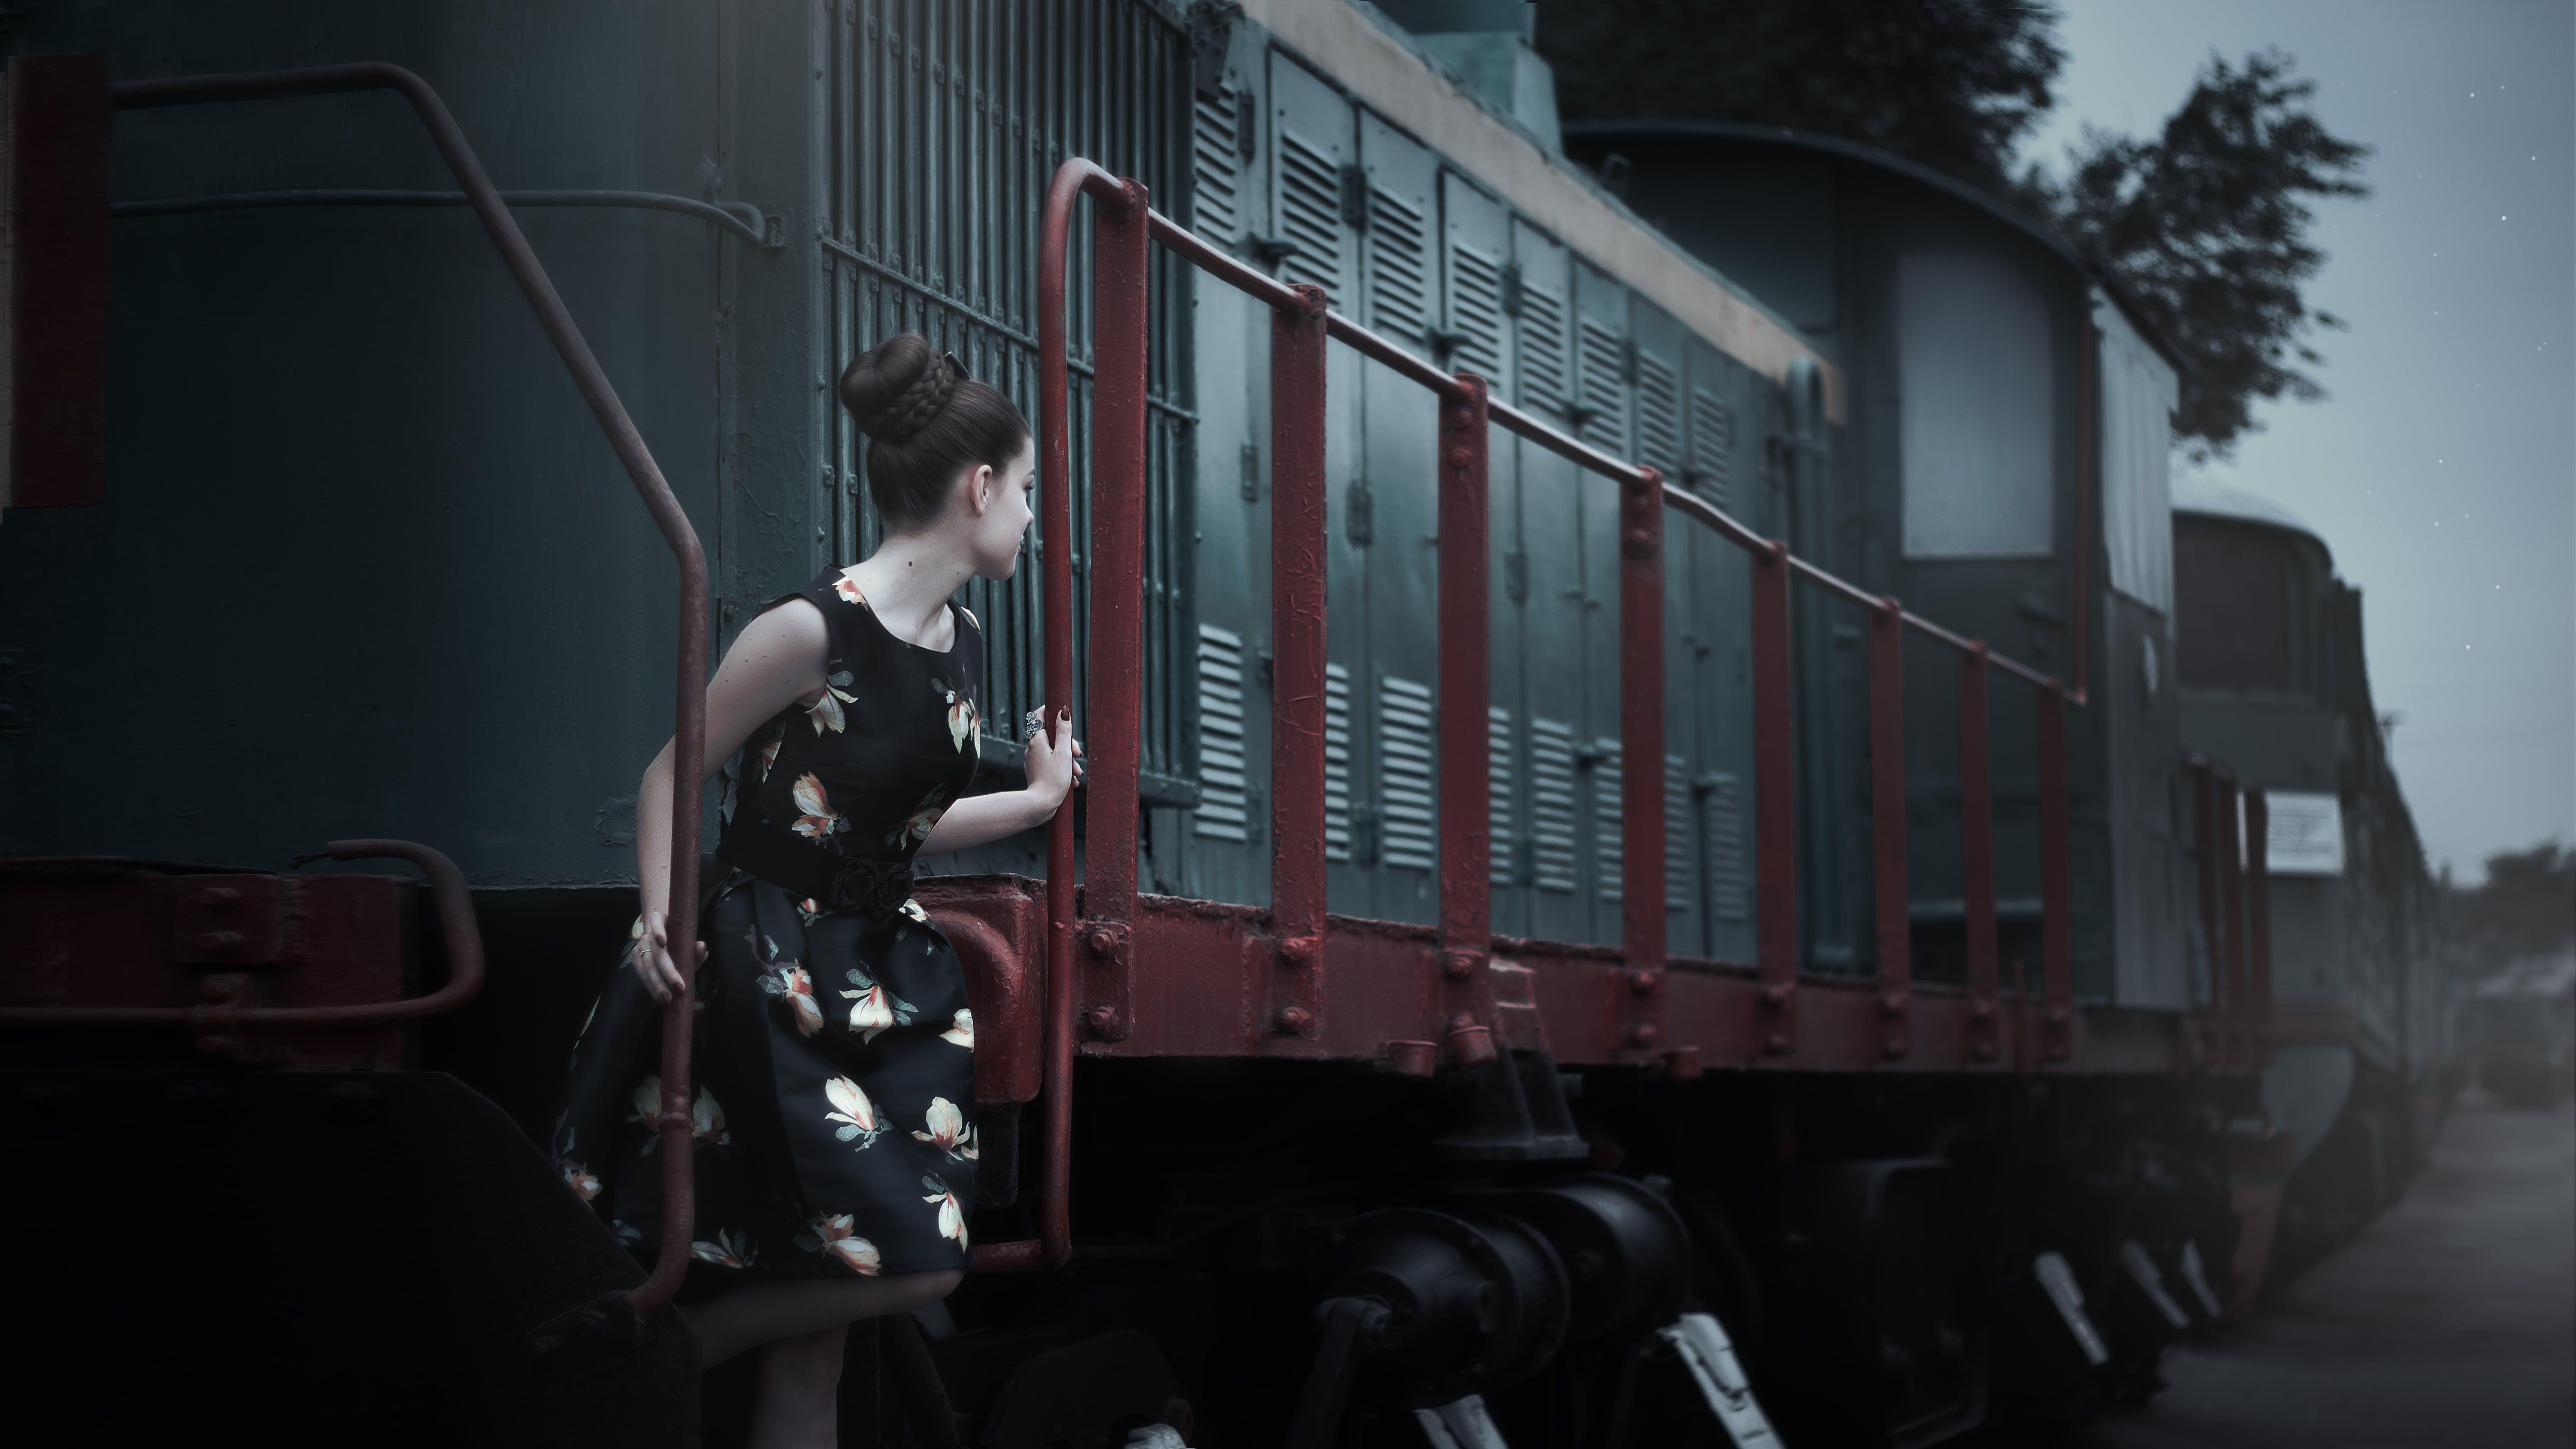 Woman in Train